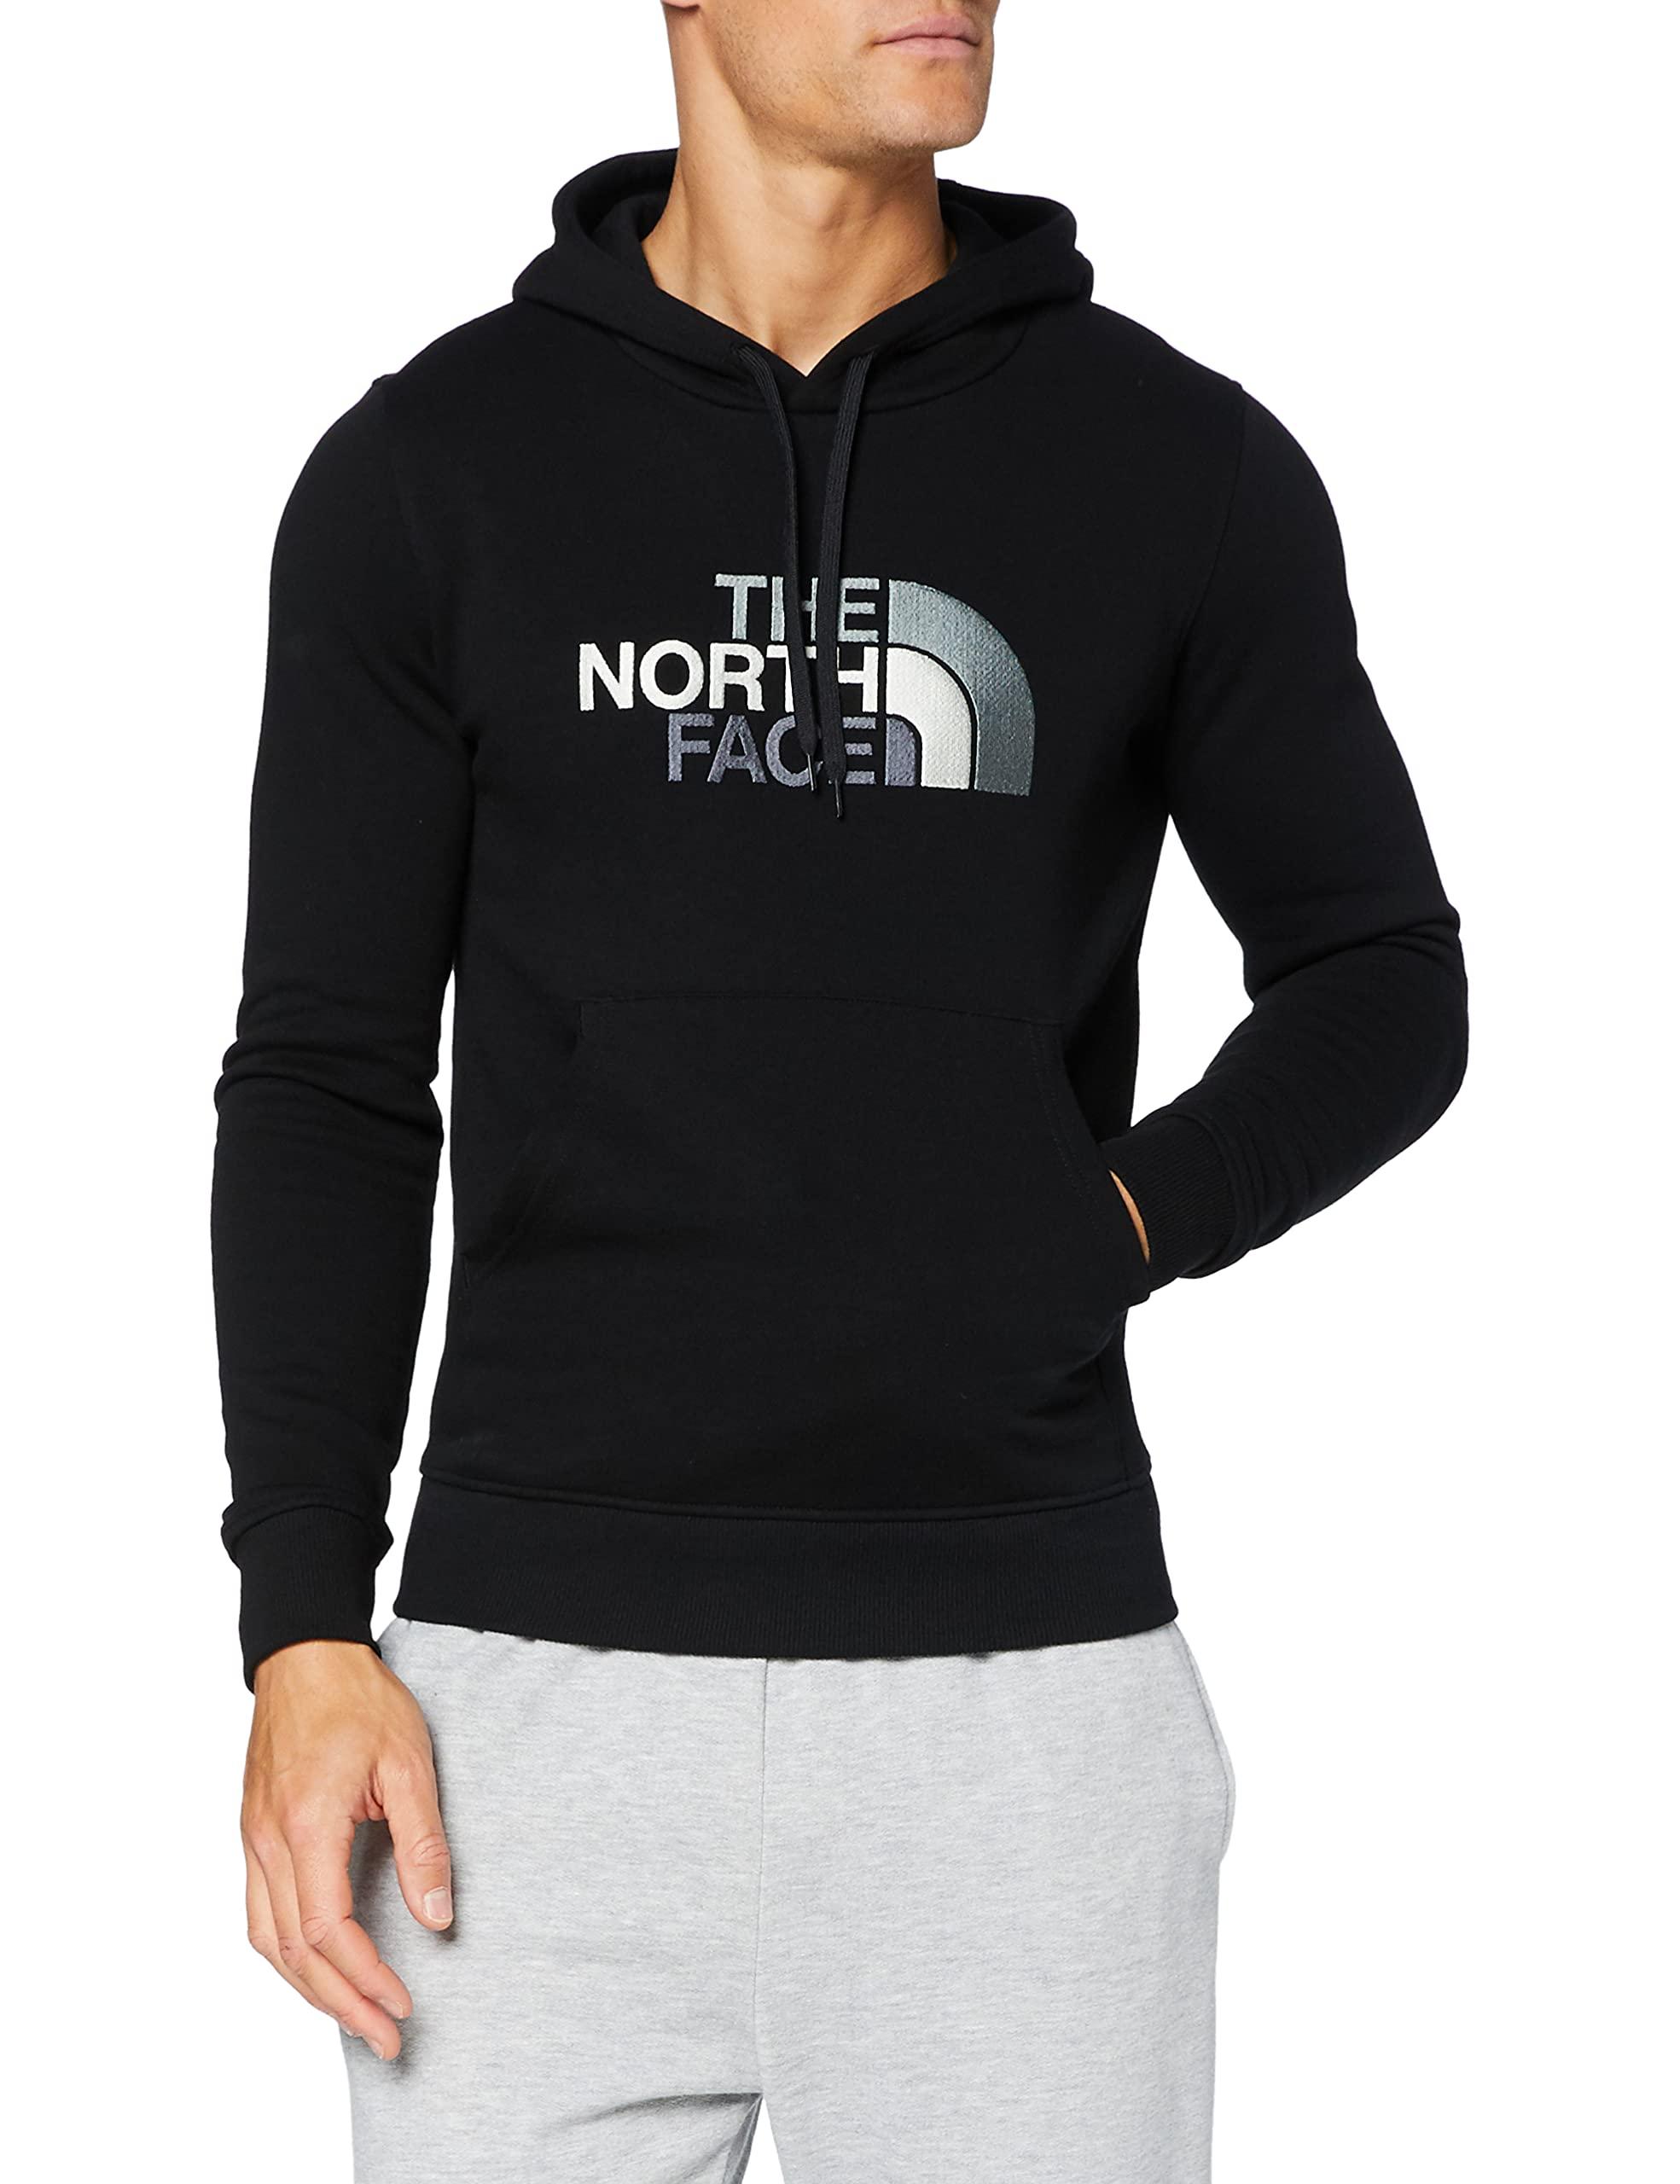 The North Face Herren Kapuzenpullover Drew Peak, tnf black, M, 0757969109045